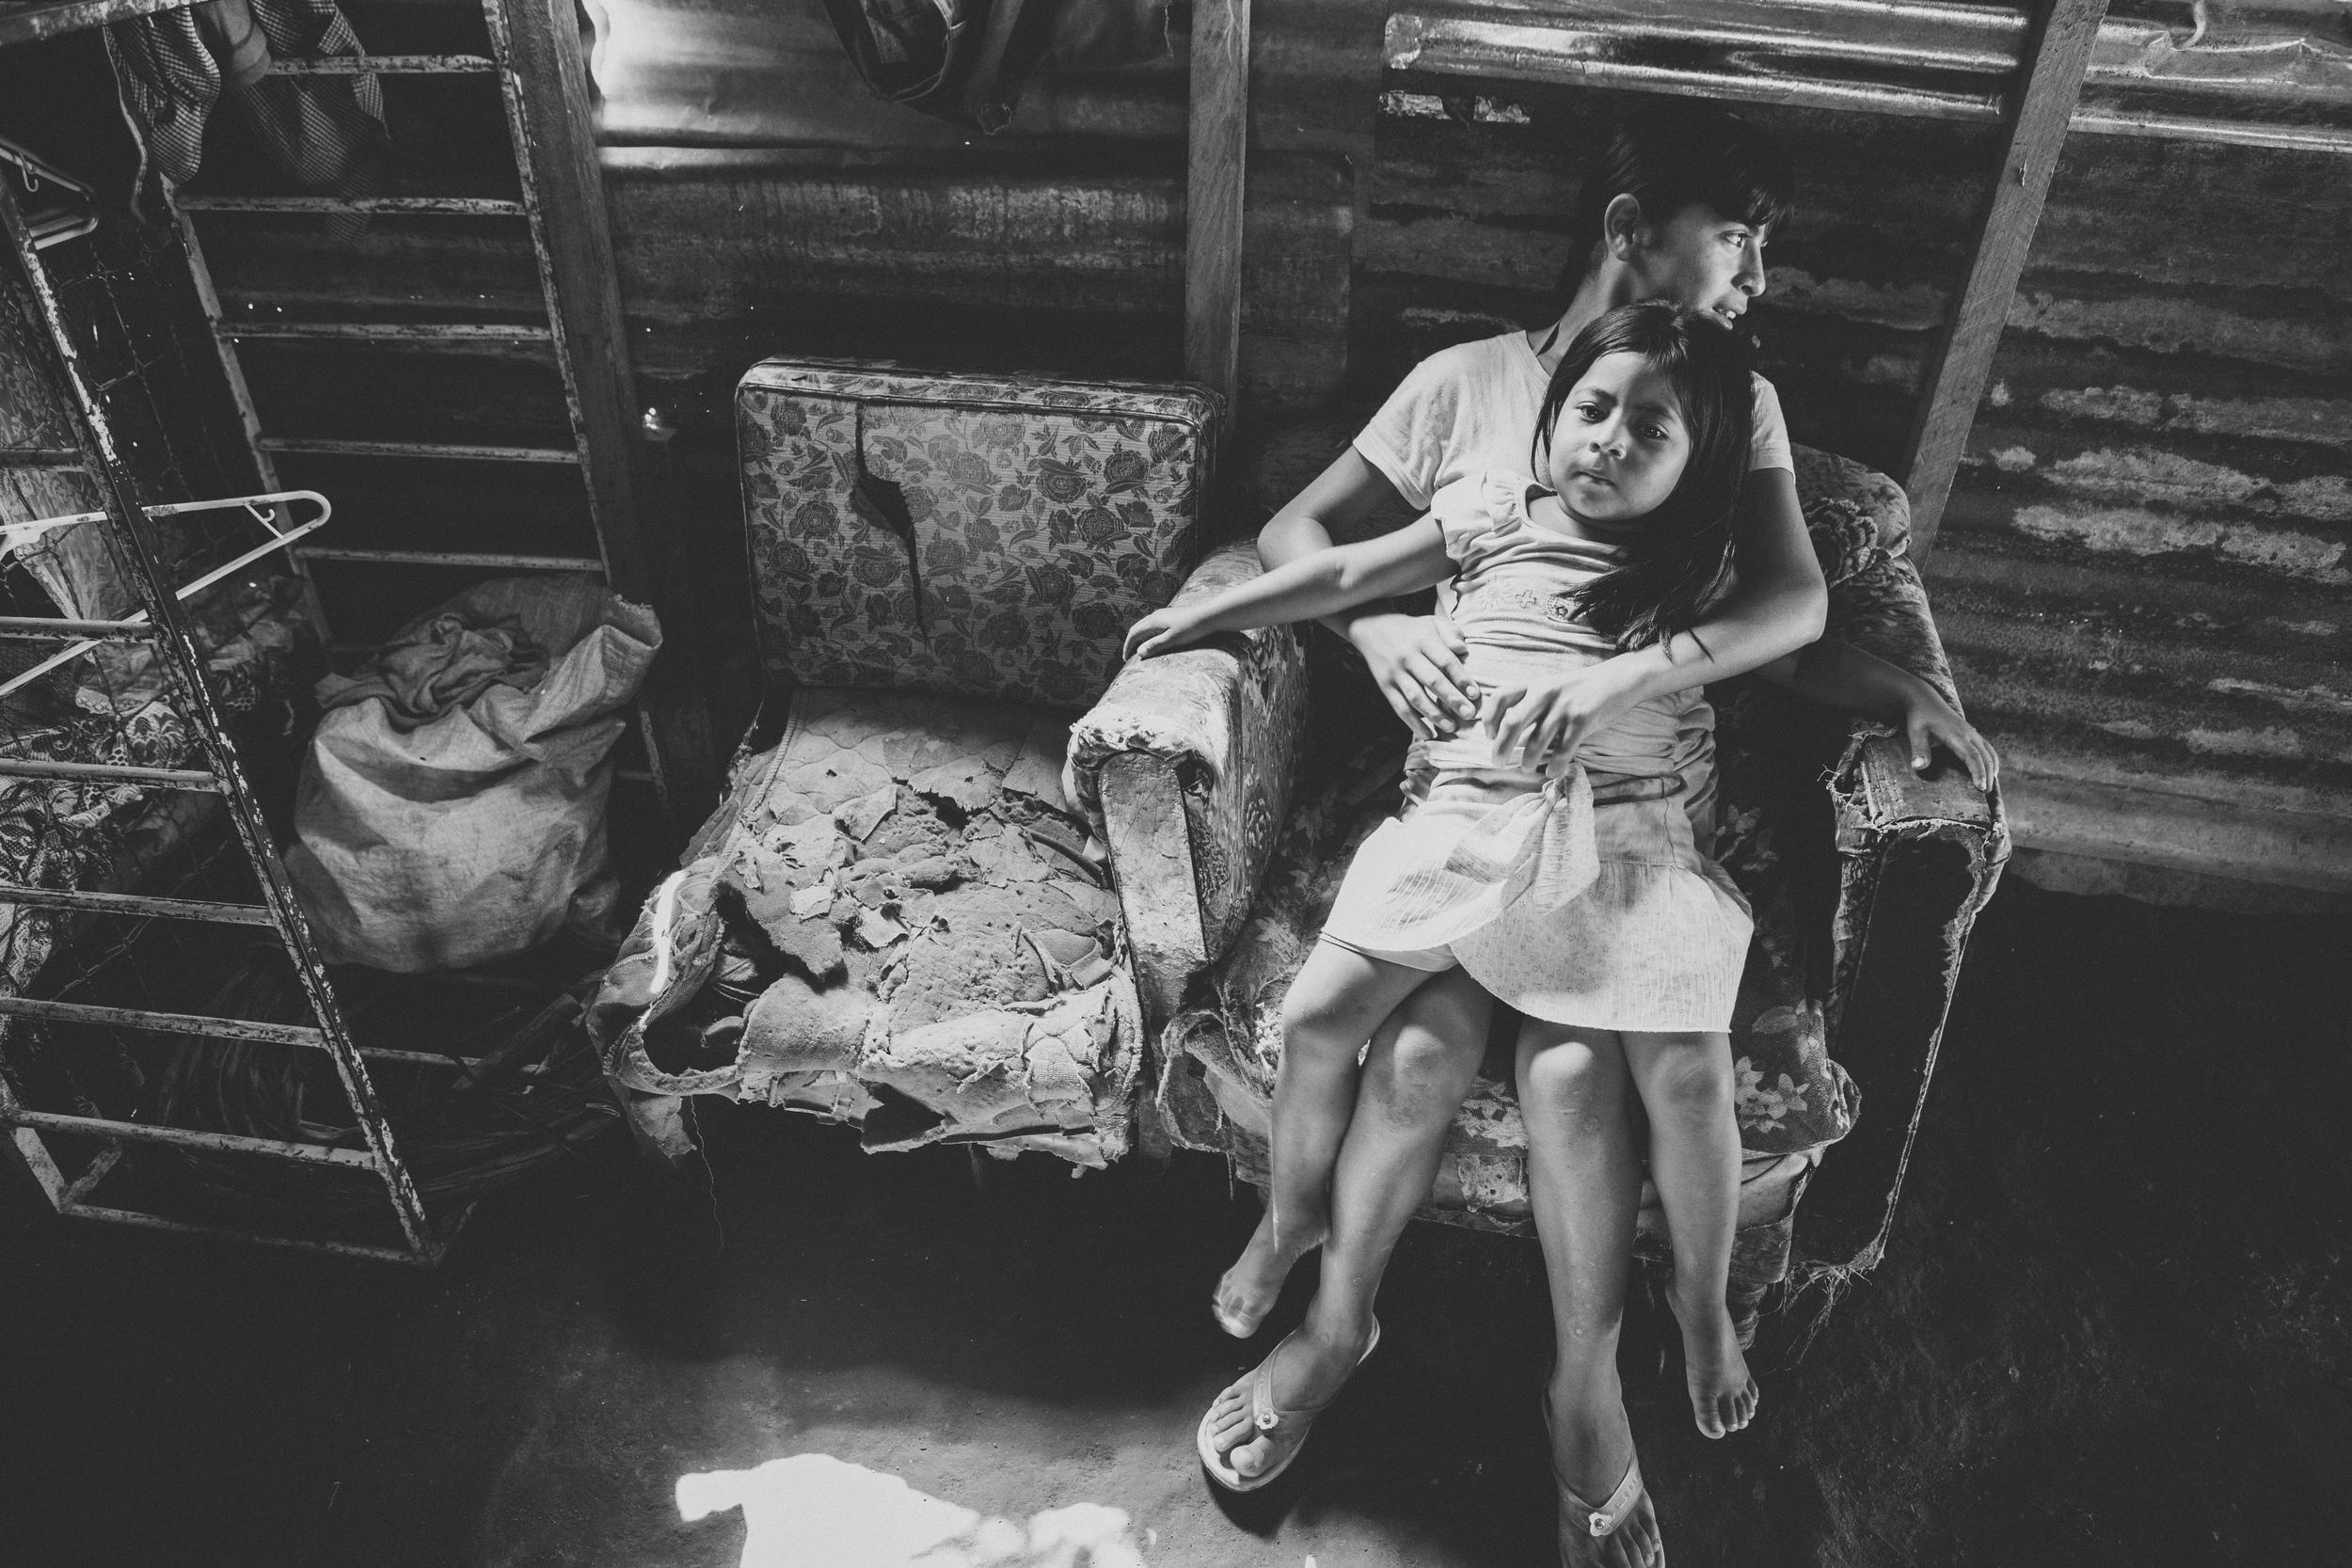 El_Milagro_Portraits_Documentary_Photography_Global_Eyes_Media_015.jpg